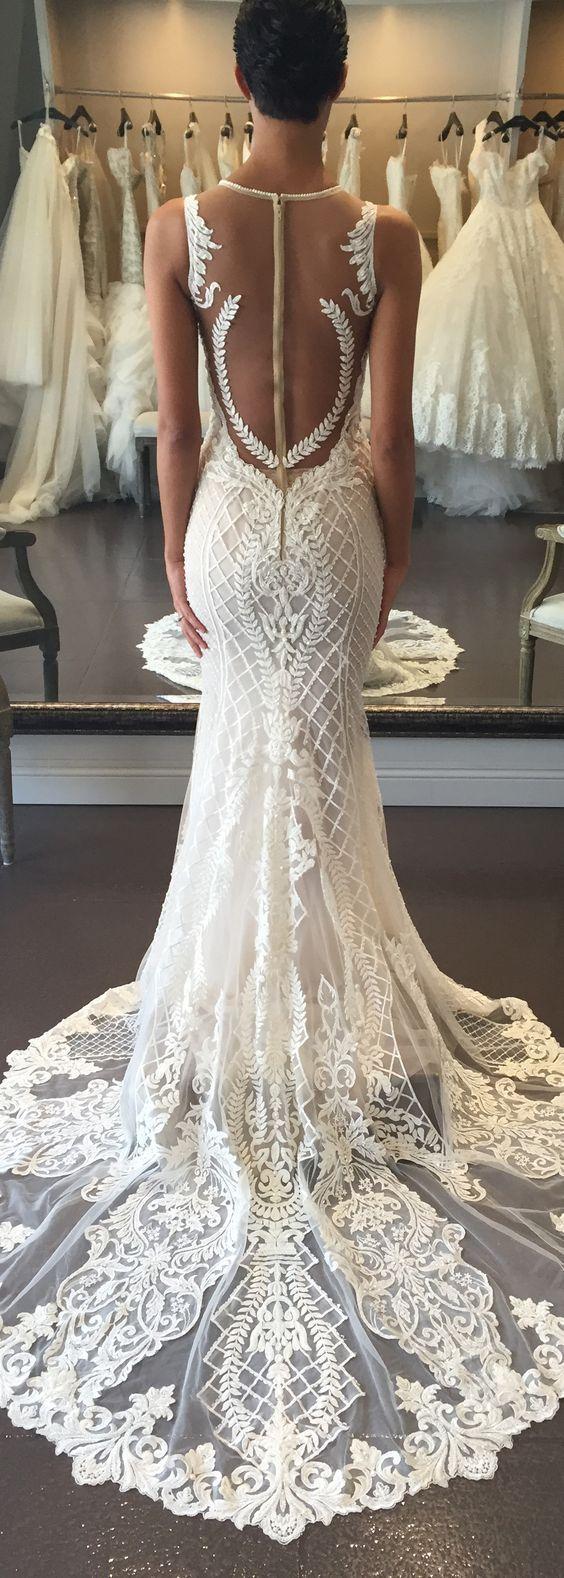 Berta Brida Wedding Dresses / http://www.deerpearlflowers.com/berta-fw-2017-wedding-dresses/3/